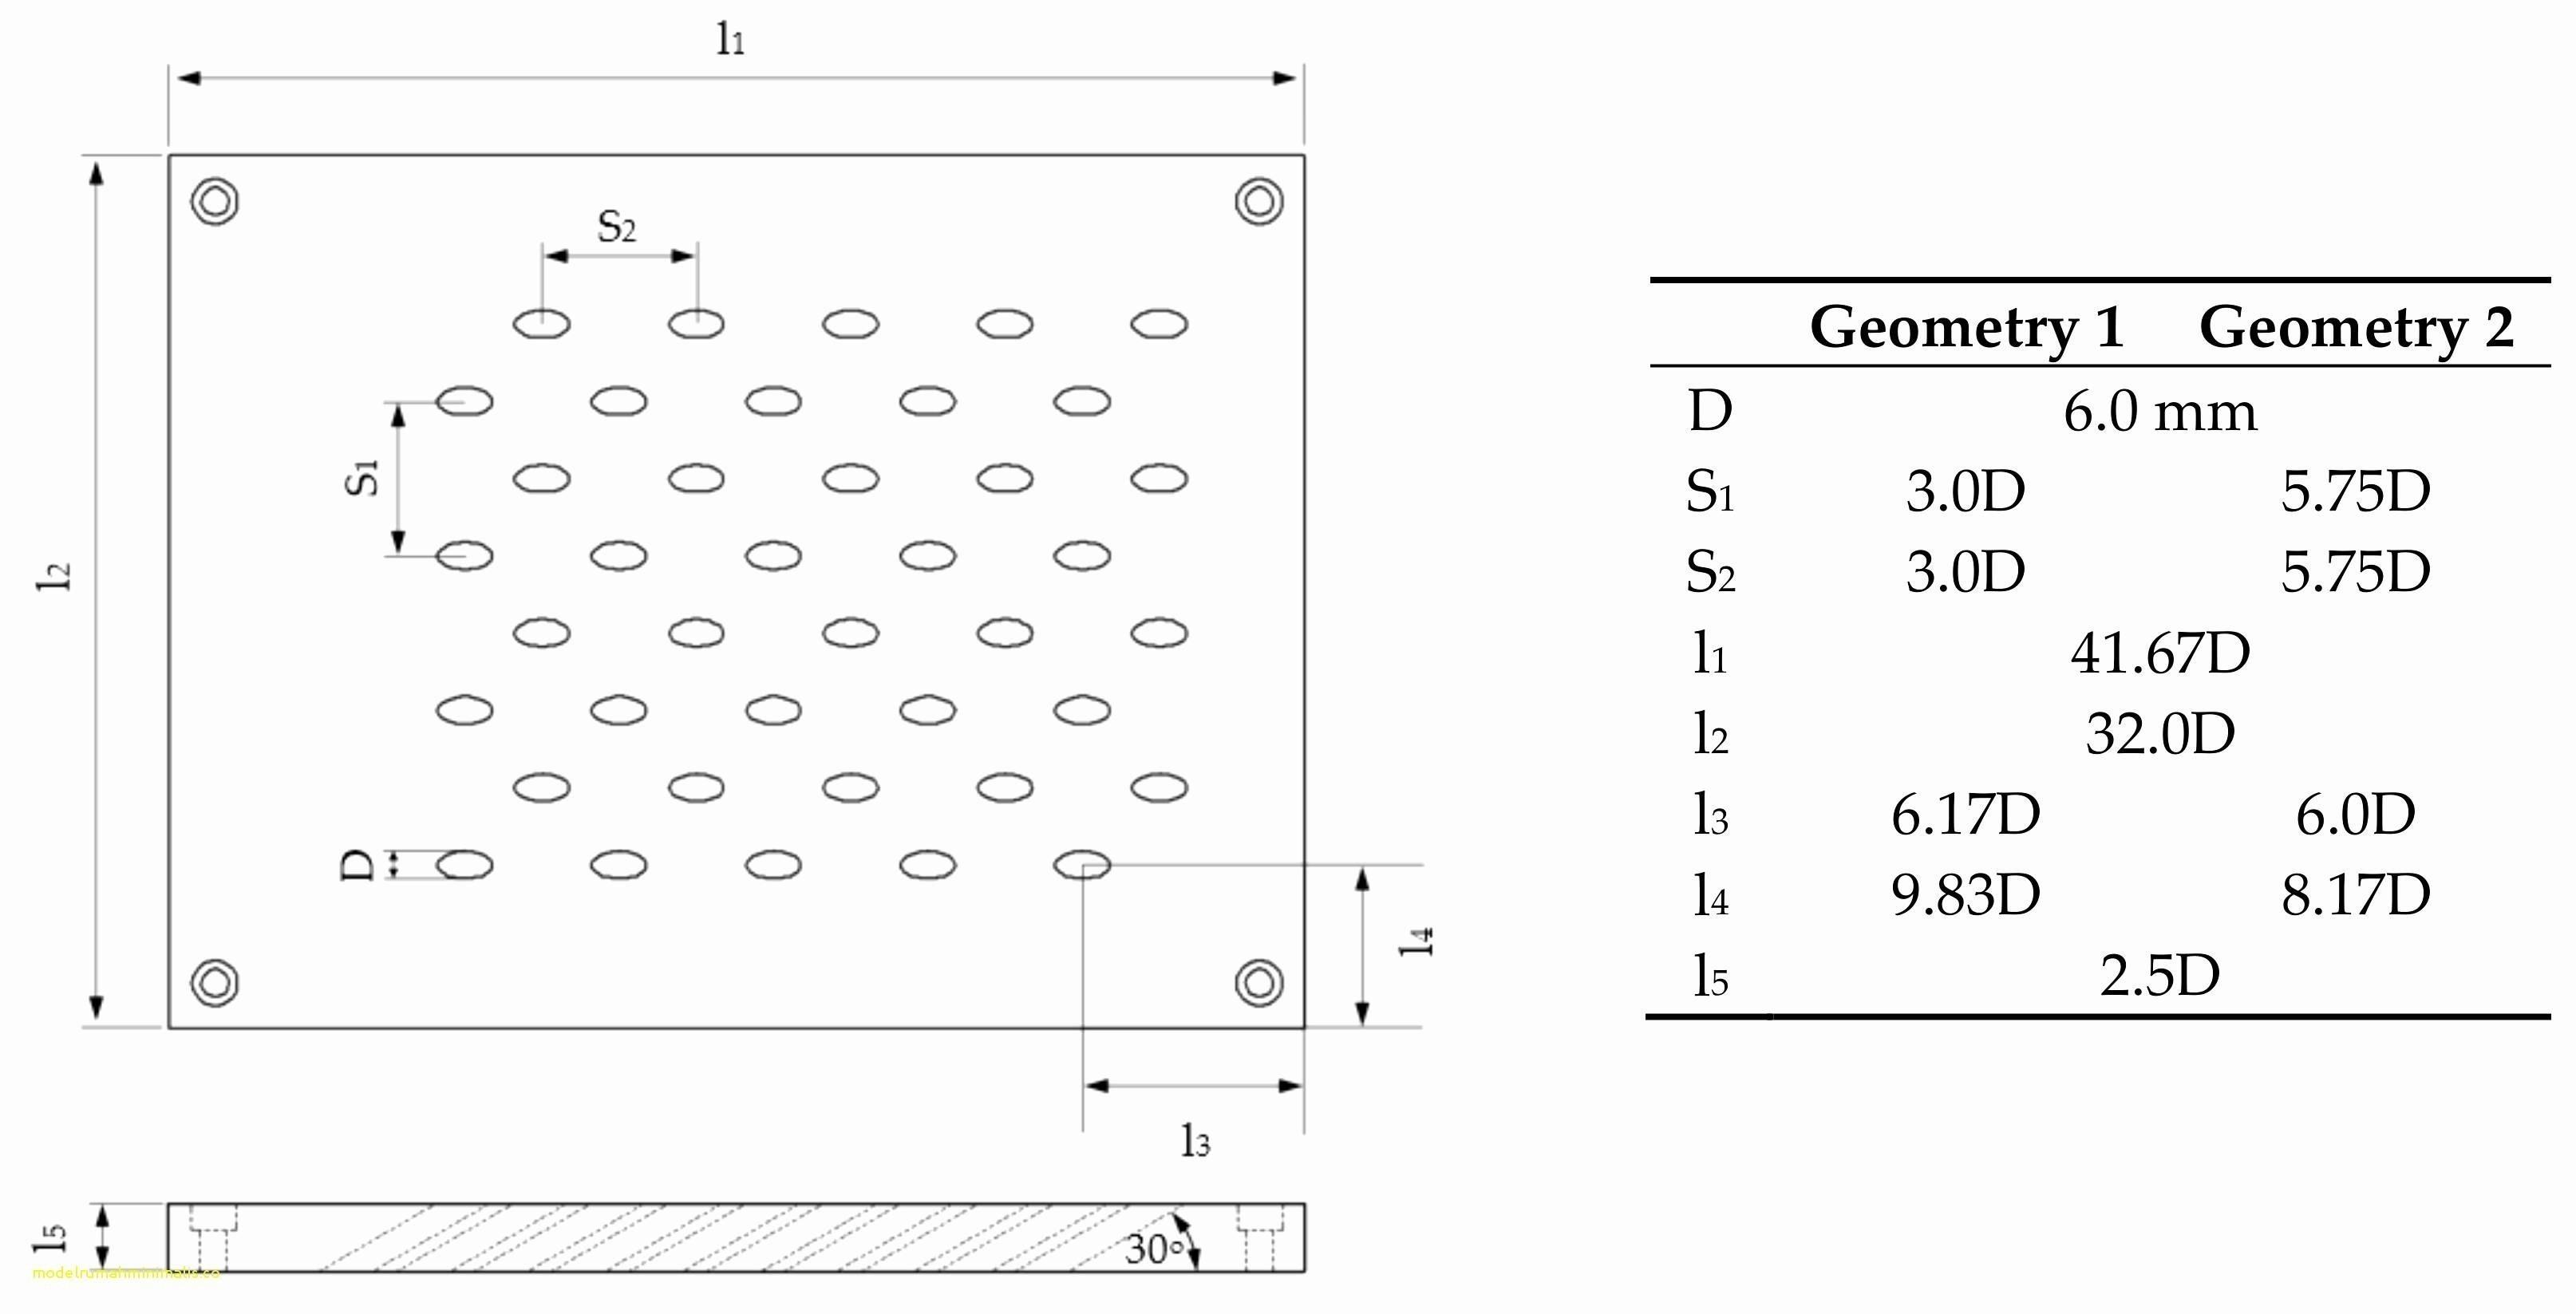 Free Printable 5Th Grade Worksheets First Grade Number Sense - Free Printable Itbs Practice Worksheets